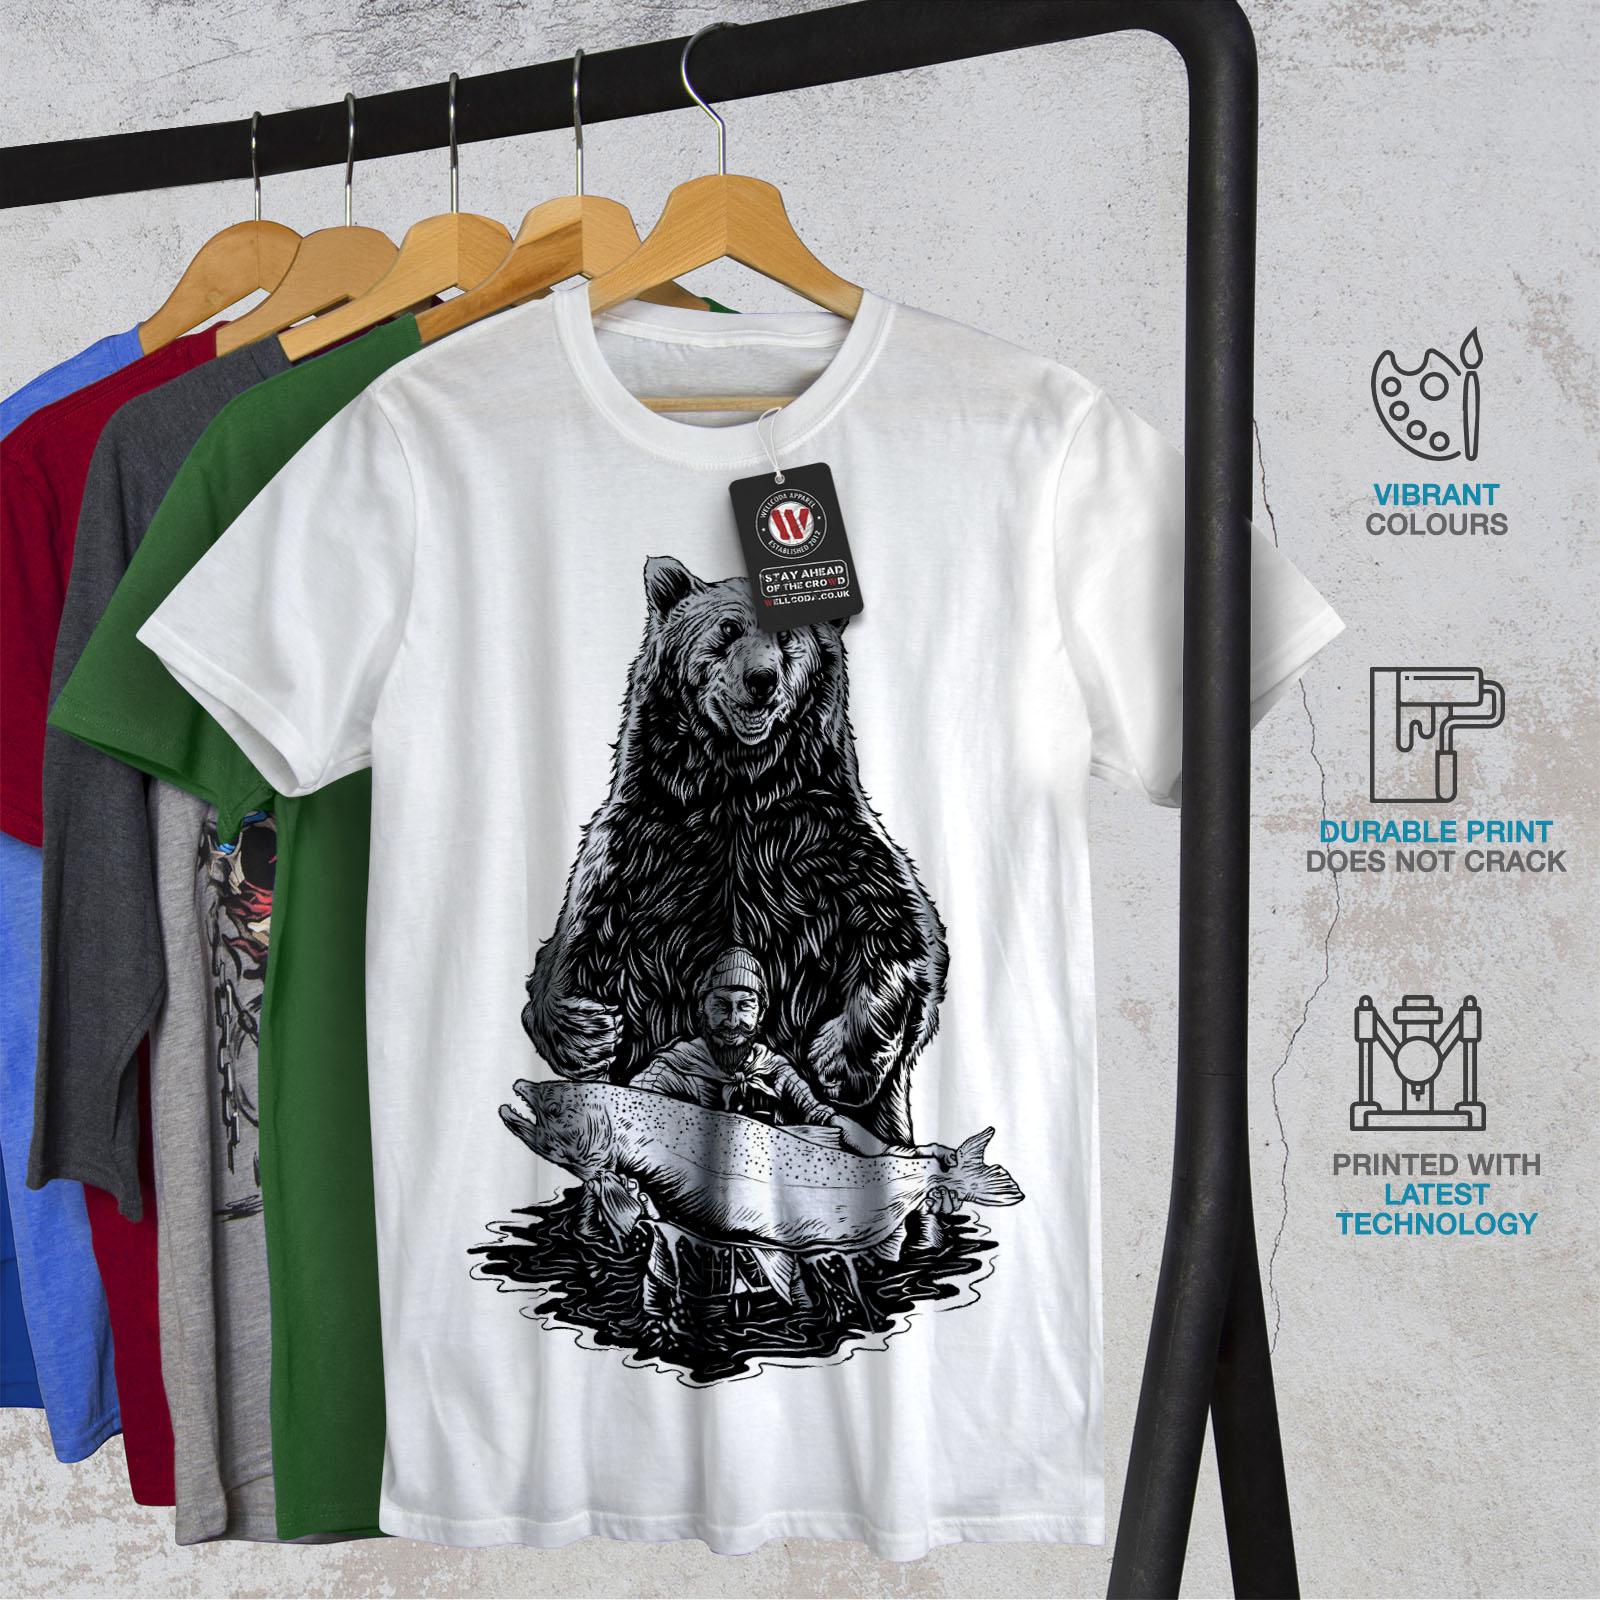 miniature 12 - Wellcoda Fishing Bear Angler Mens T-shirt, Grizzly Graphic Design Printed Tee